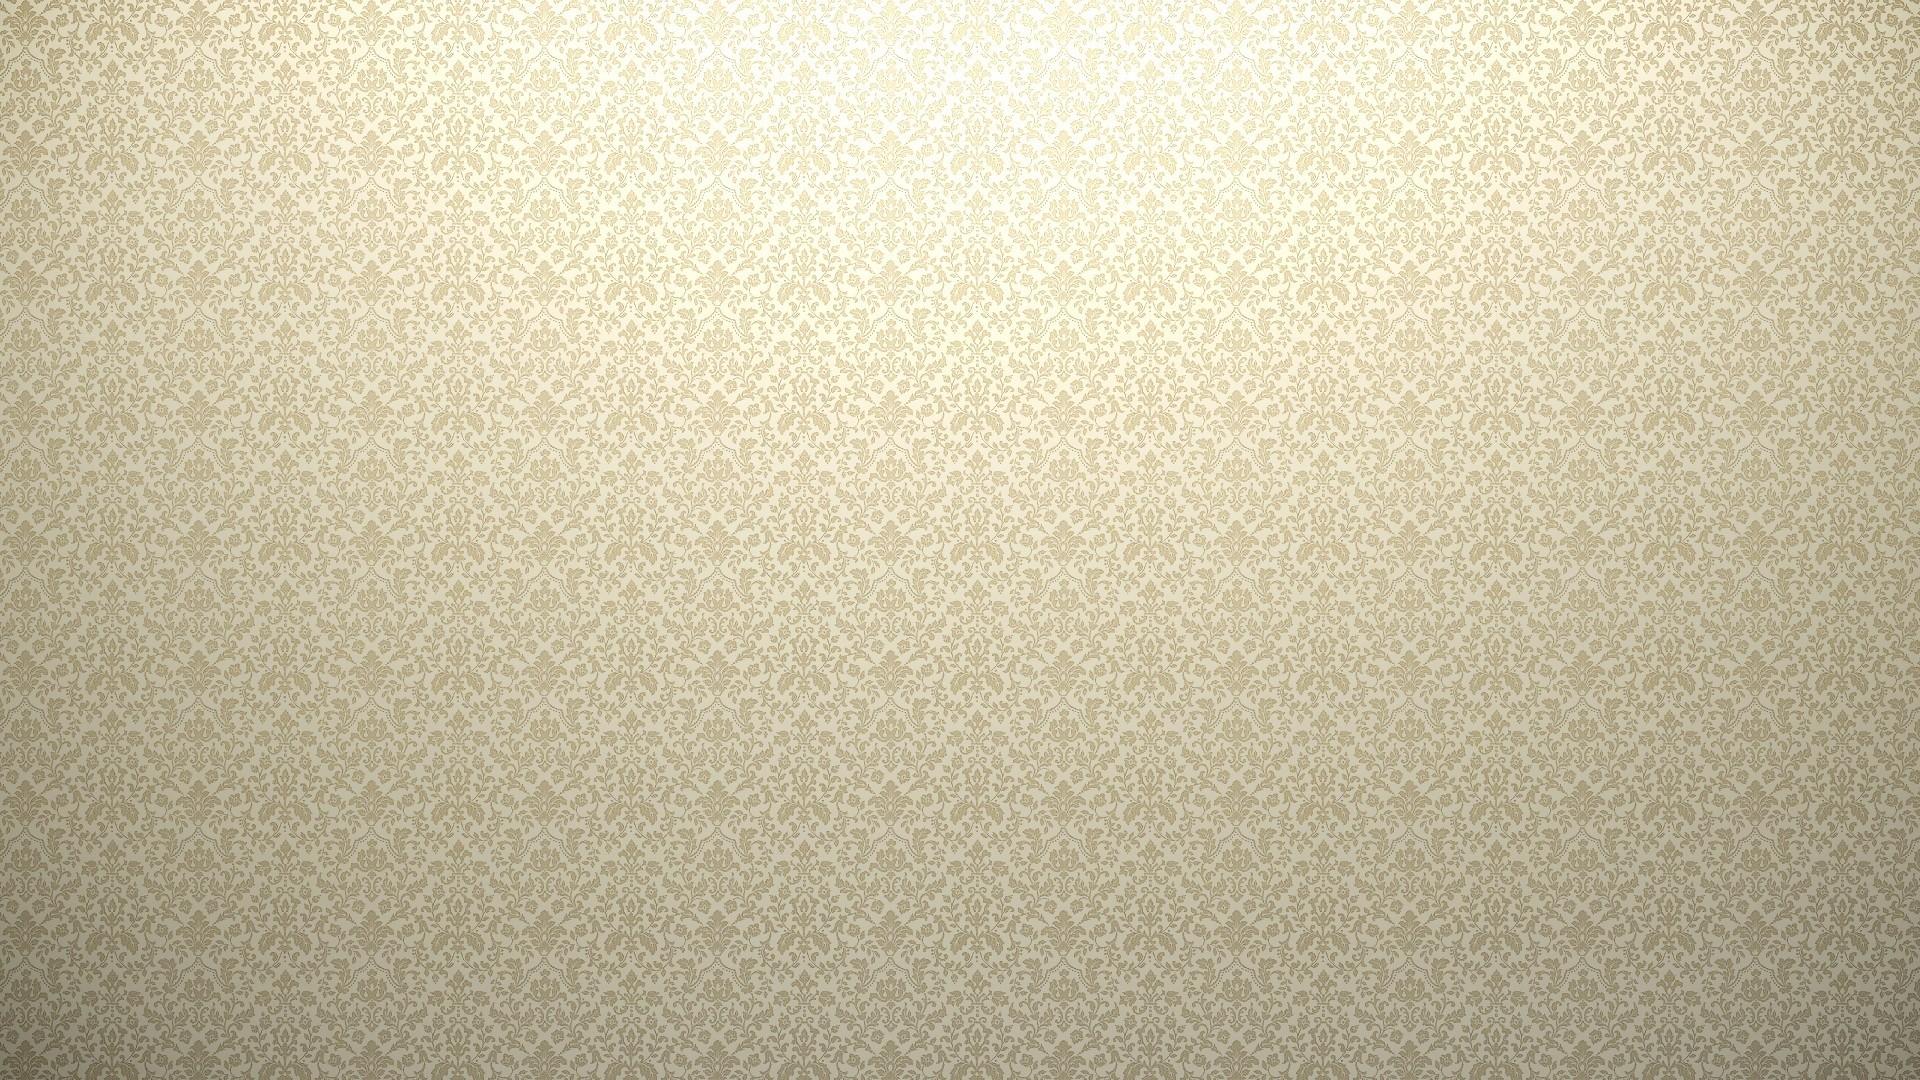 Plain White Wallpapers HD – WallpaperSafari